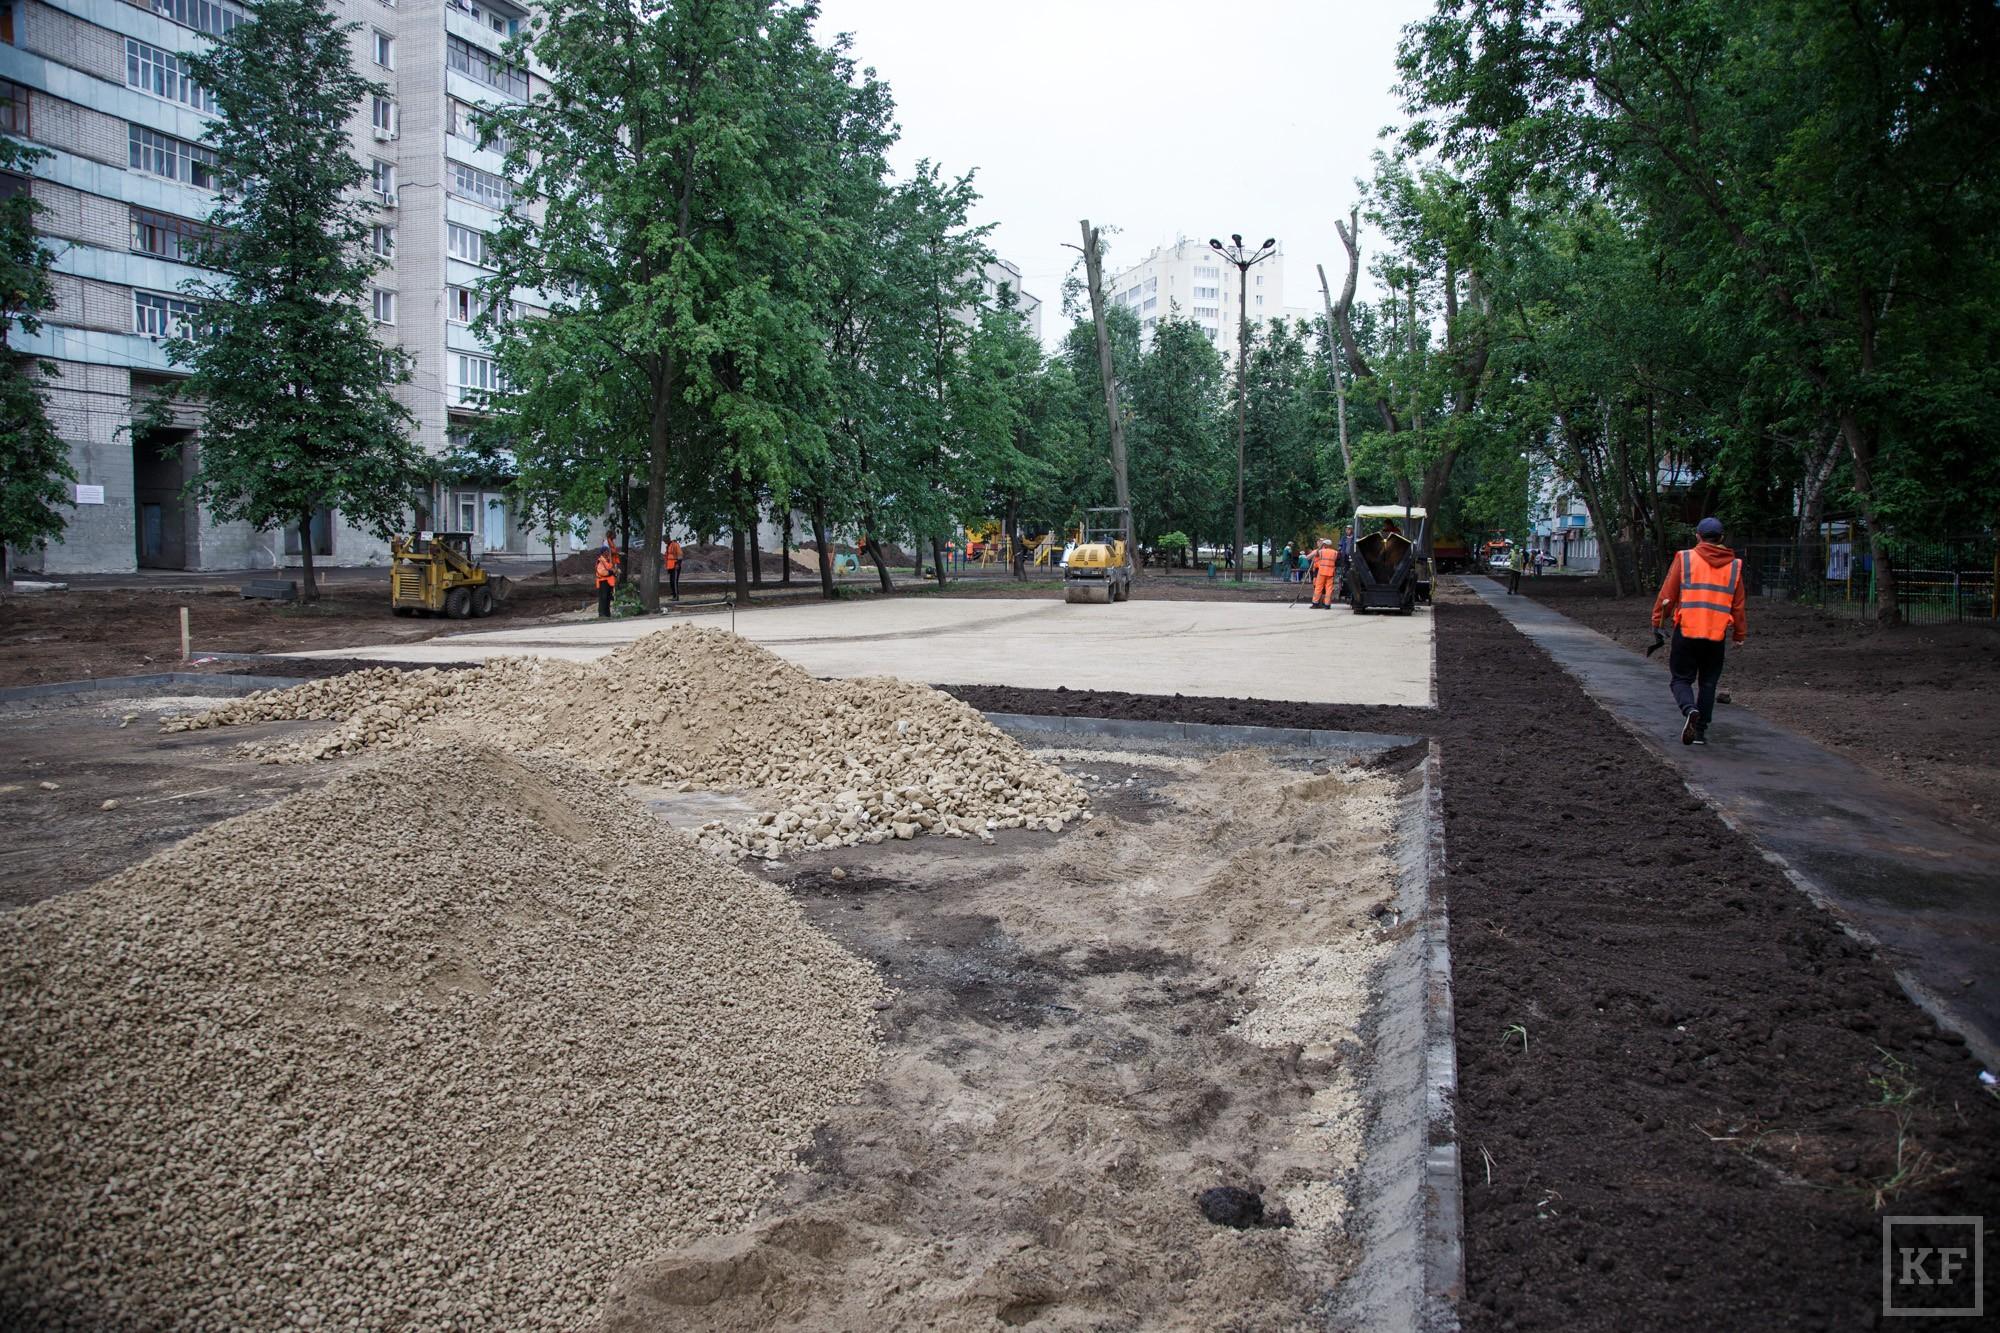 Один из дворов Казани оборудуют площадками для стритбола и занятий шахматами